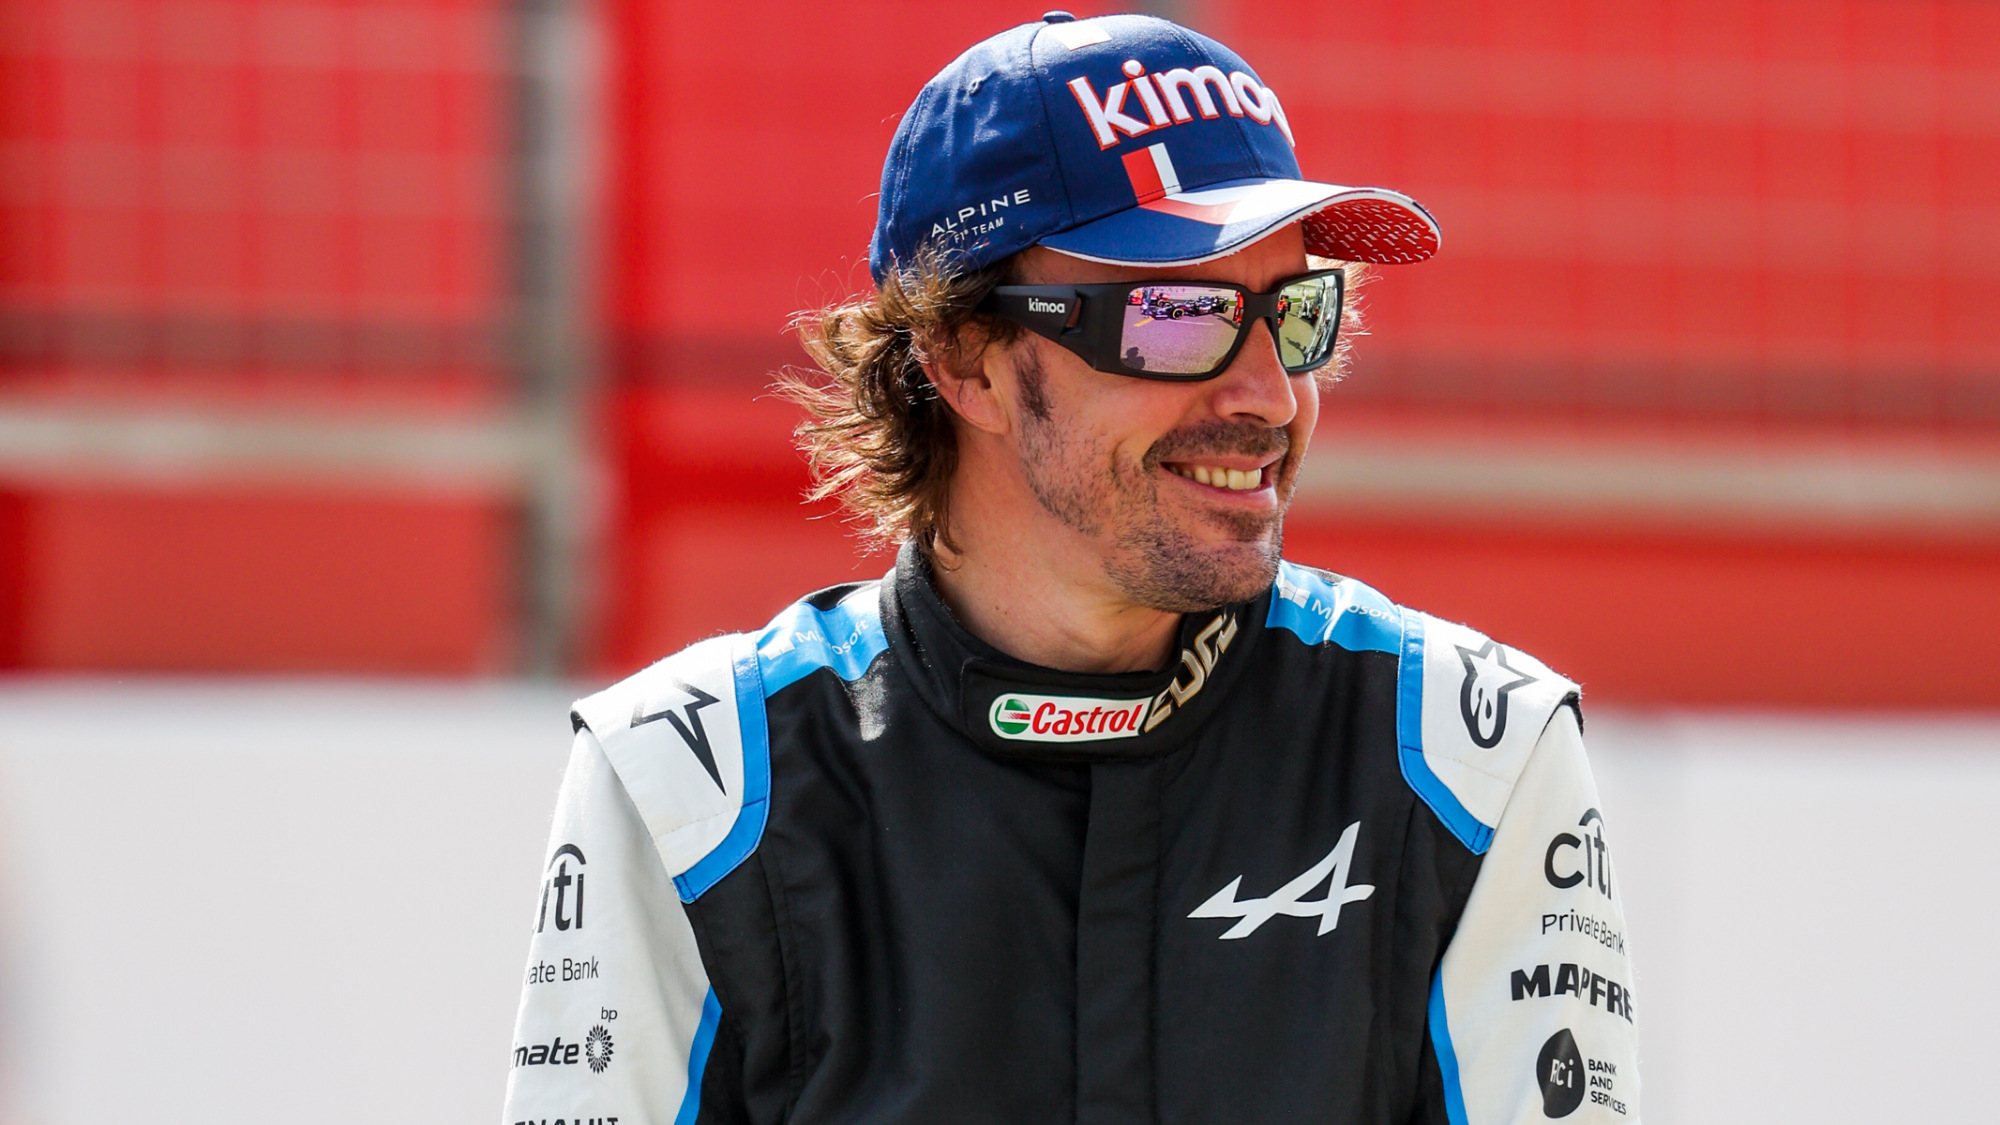 Fernando Alonso, 2021 Alpine F1 Team